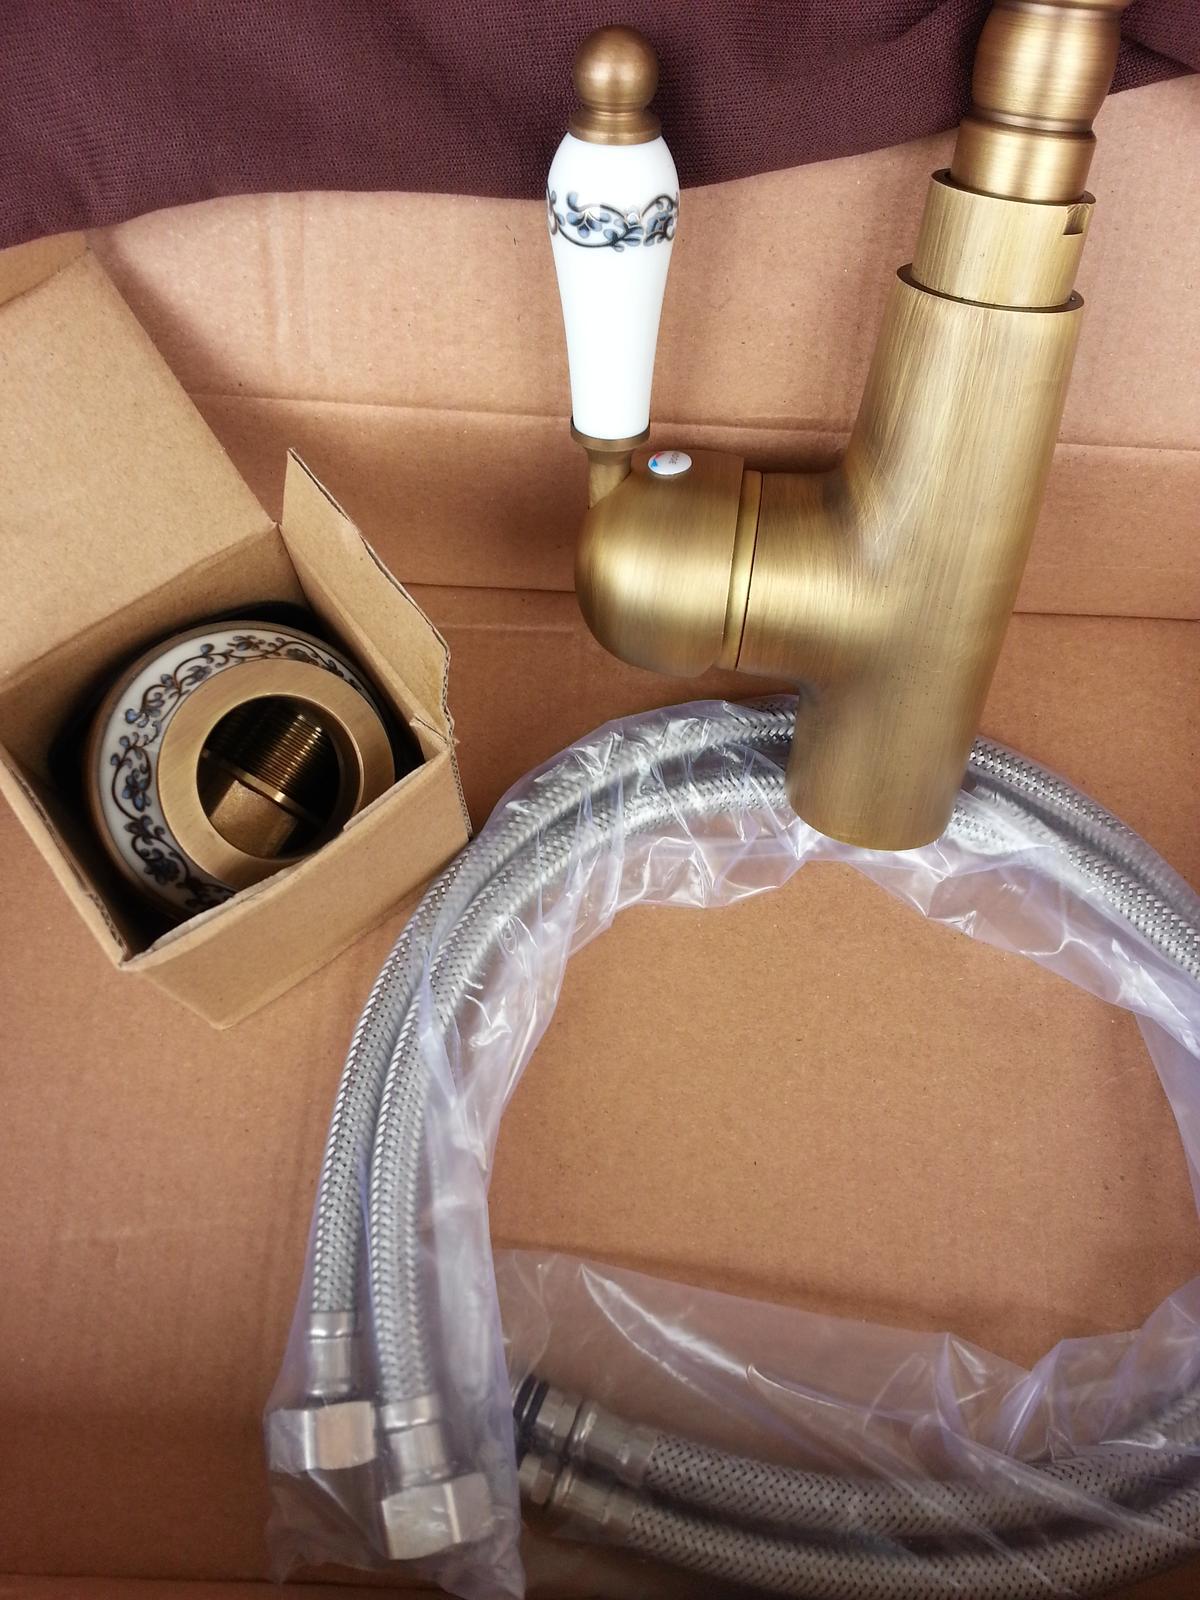 Vodovodná batéria Retroflow gold - Obrázok č. 3